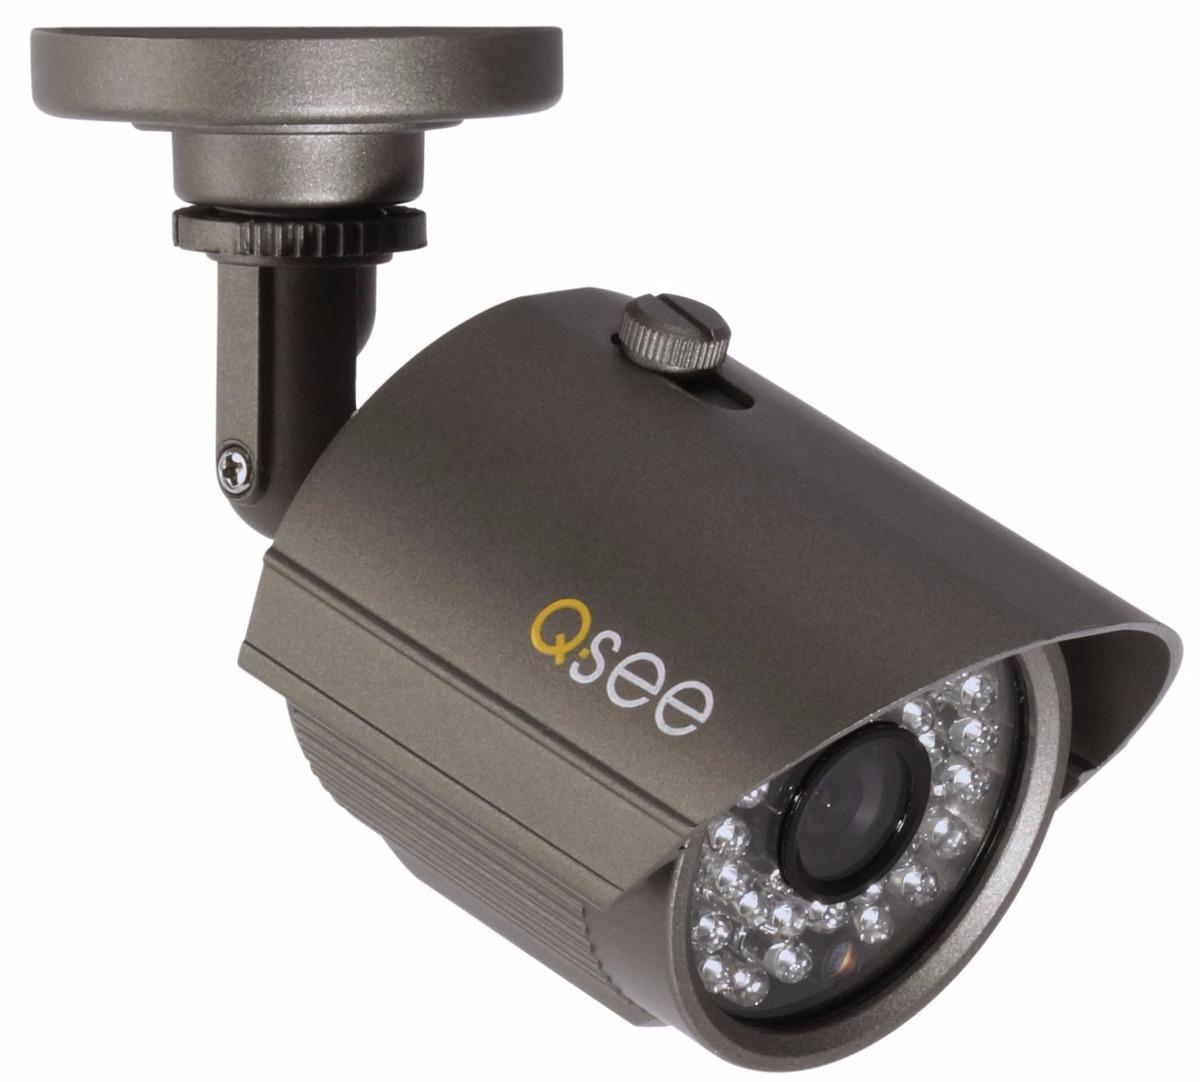 Q See Qt534 4e4 5 4 Channel Full D1 Surveillance System